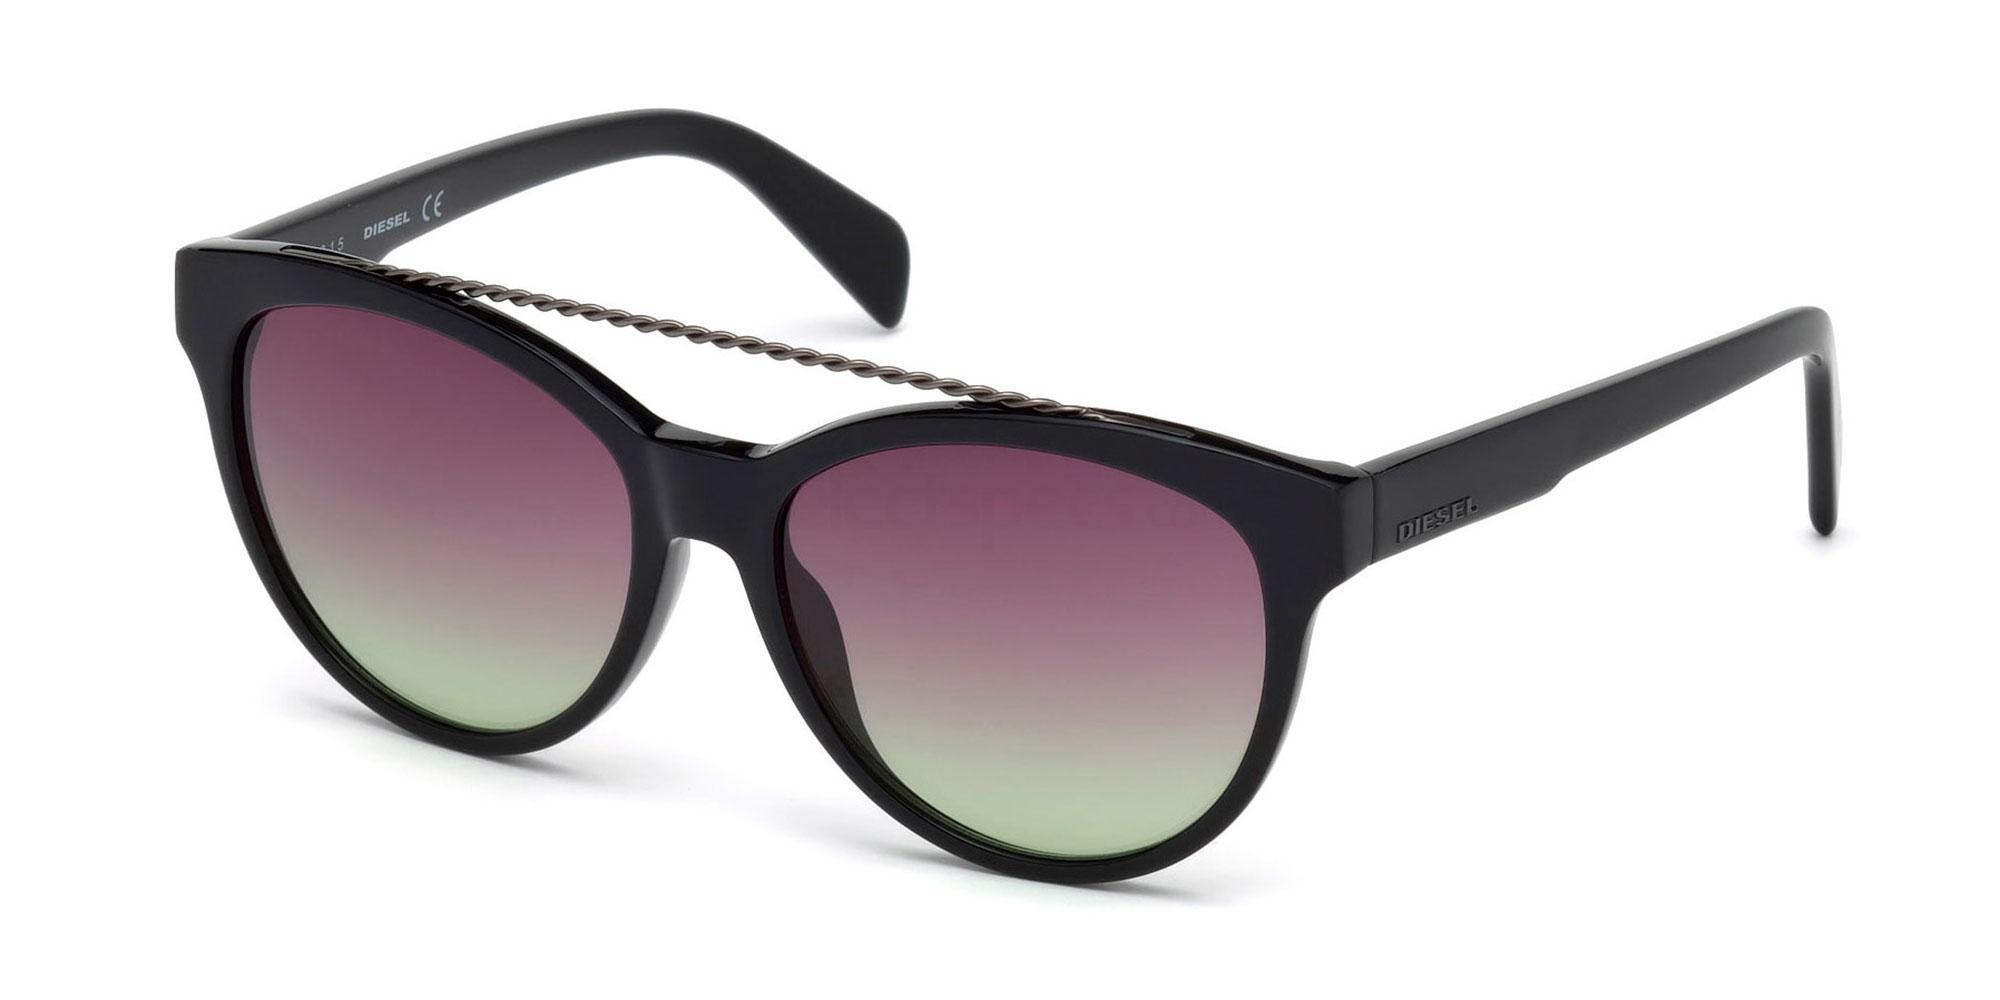 01T DL0189 Sunglasses, Diesel